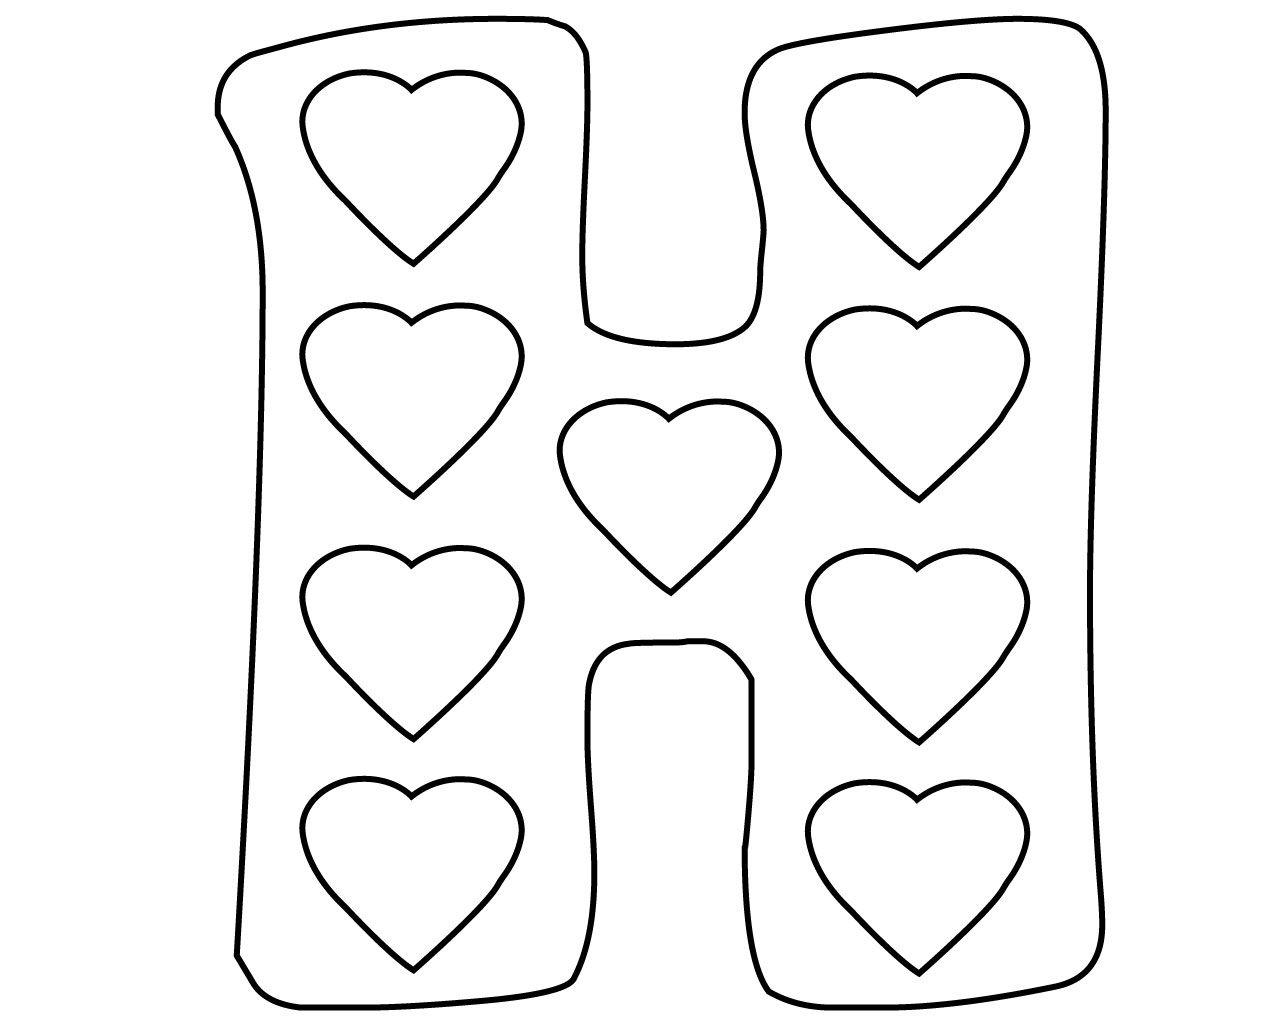 Free Printable Letter H Coloring Pages Lettres Imprimables Gratuitement Lettres Imprimables Coloriage Enfant